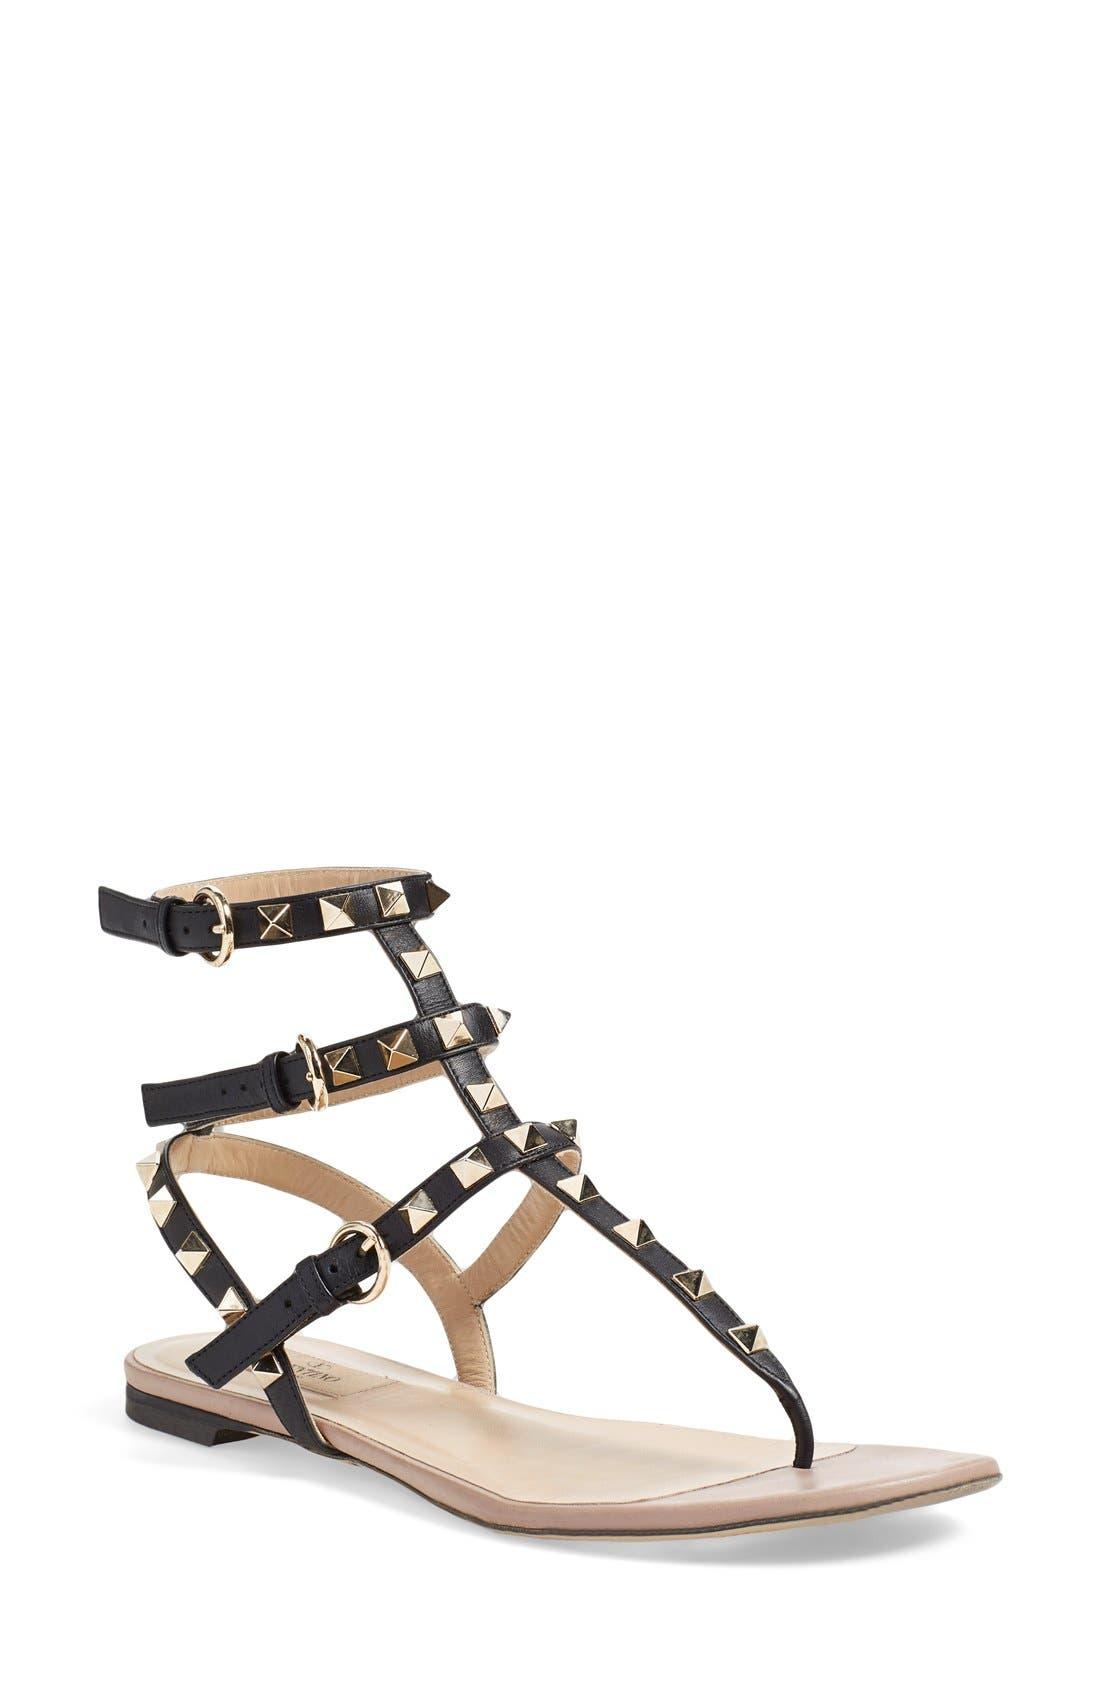 Alternate Image 1 Selected - VALENTINO GARAVANI 'Rockstud' Sandal (Women)